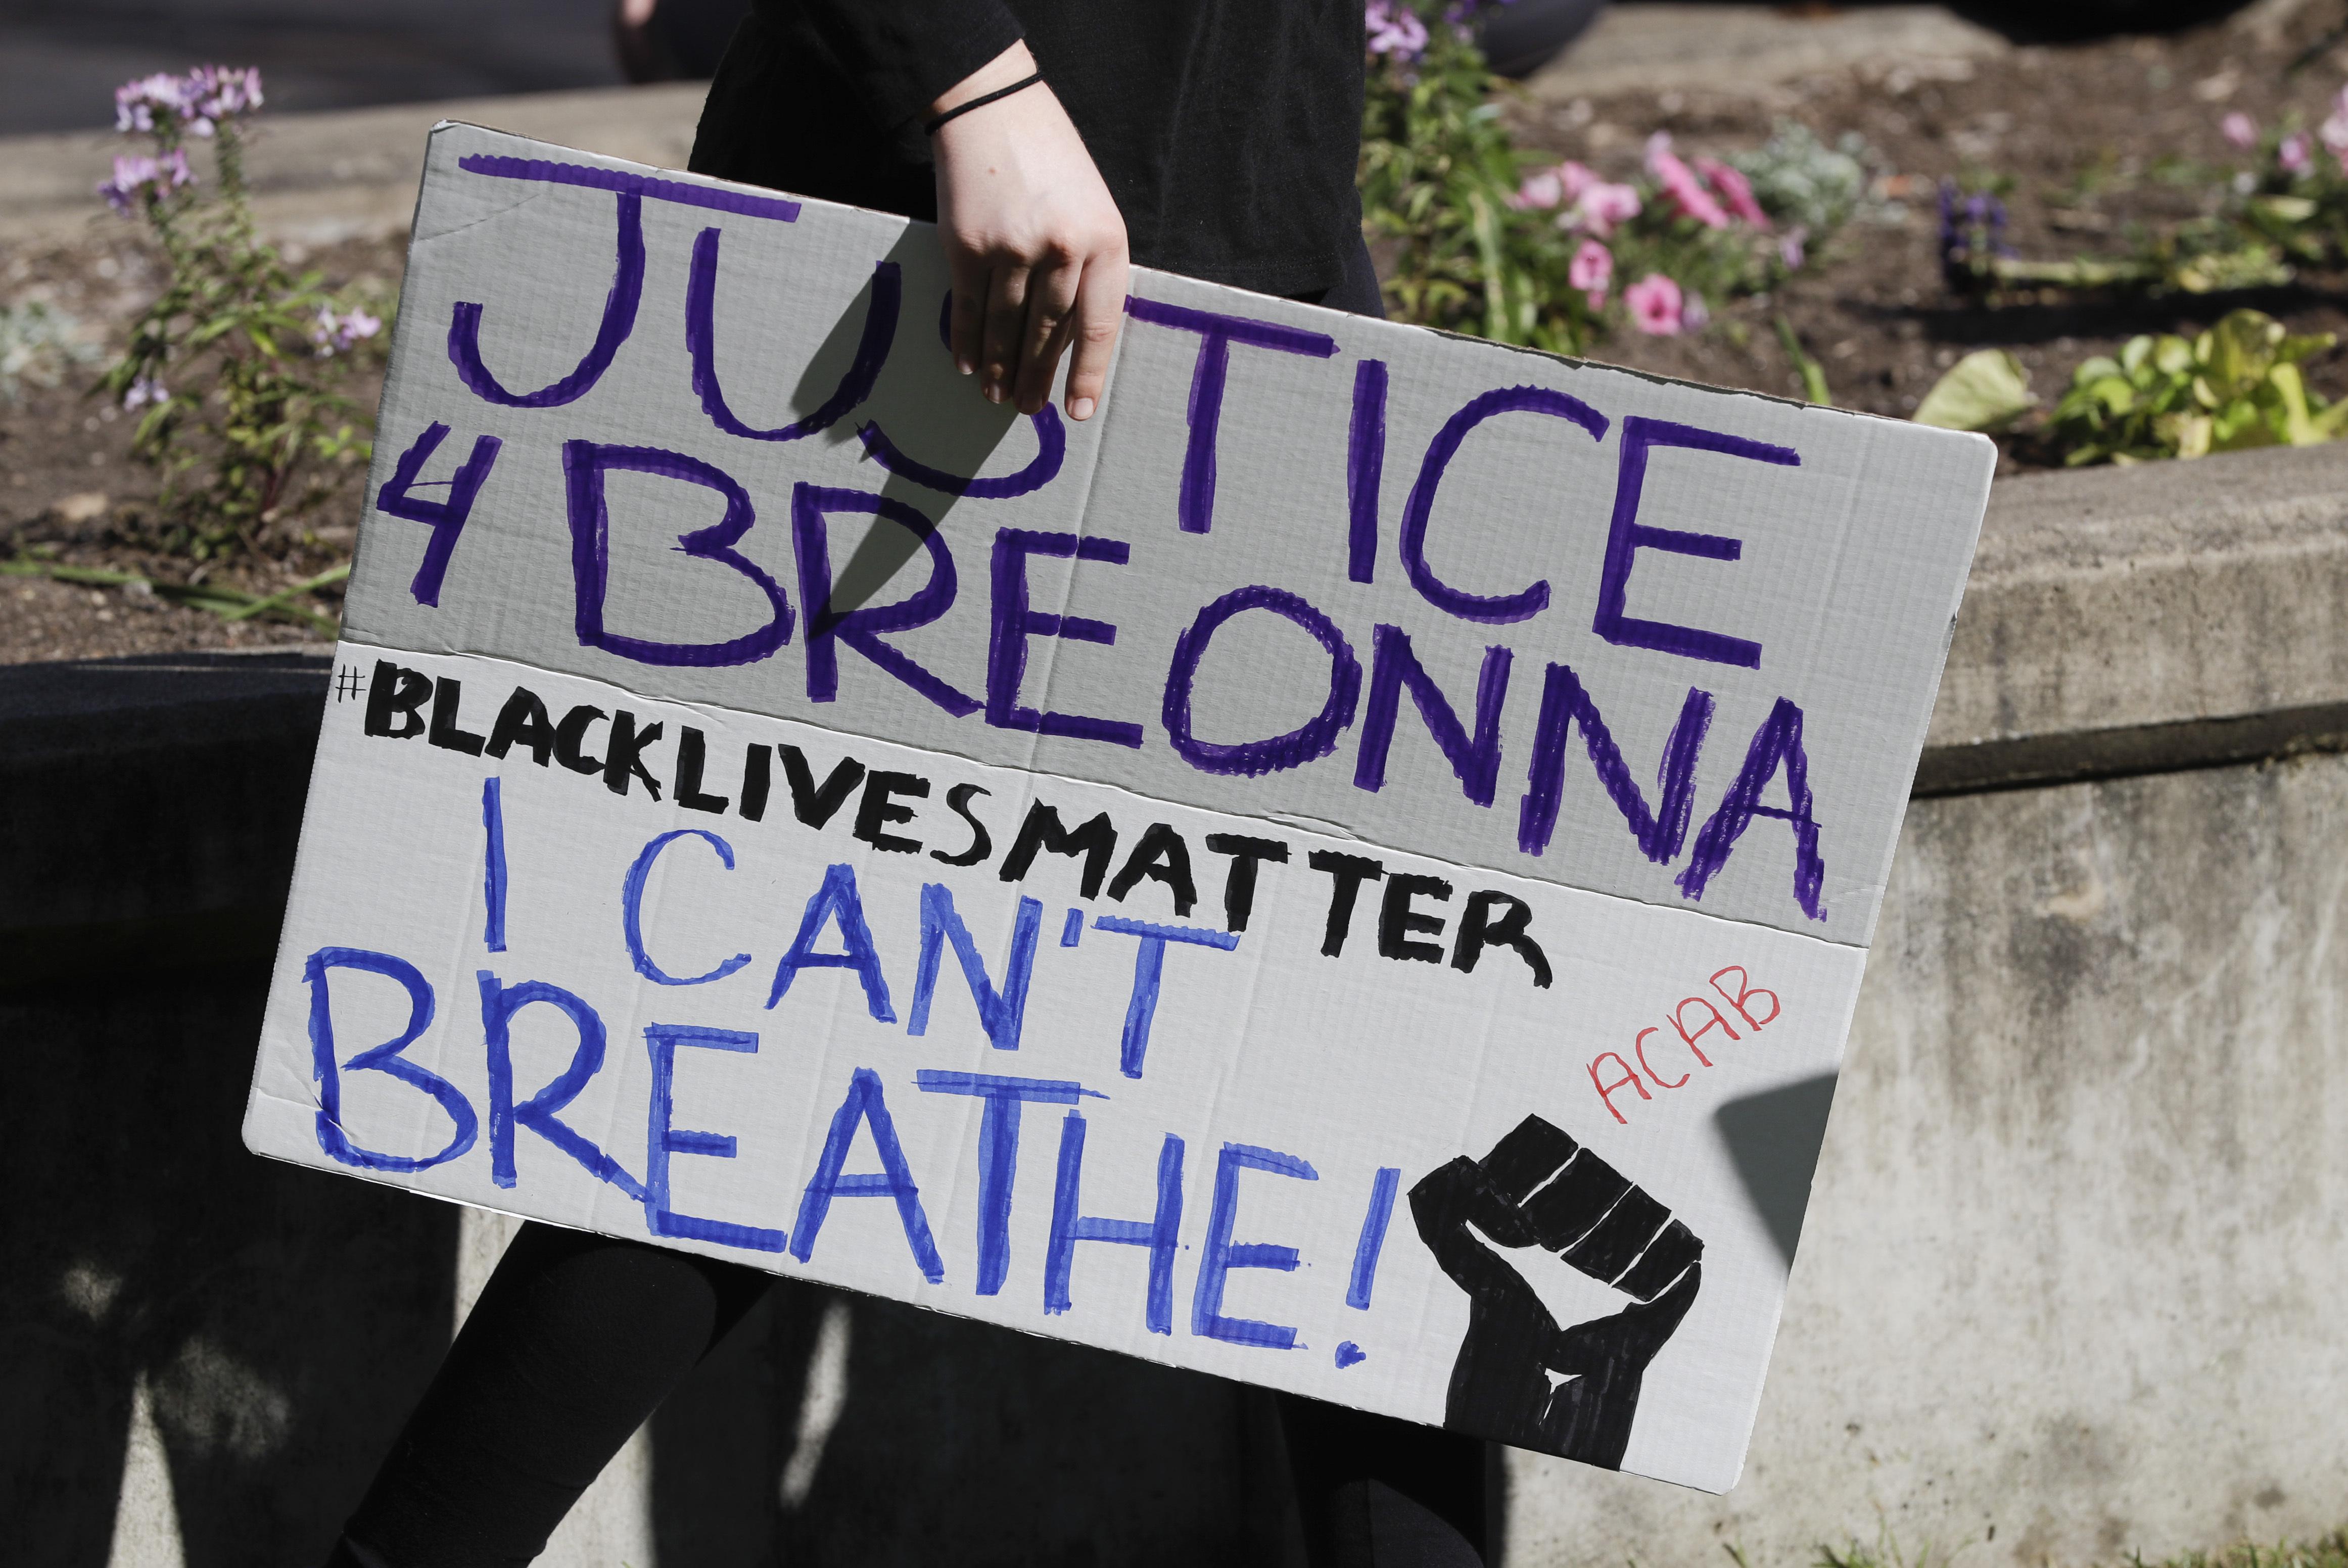 After Breonna Taylor S Death Louisville Bans No Knock Warrants And Sen Rand Paul Proposes Federal Ban The Washington Post